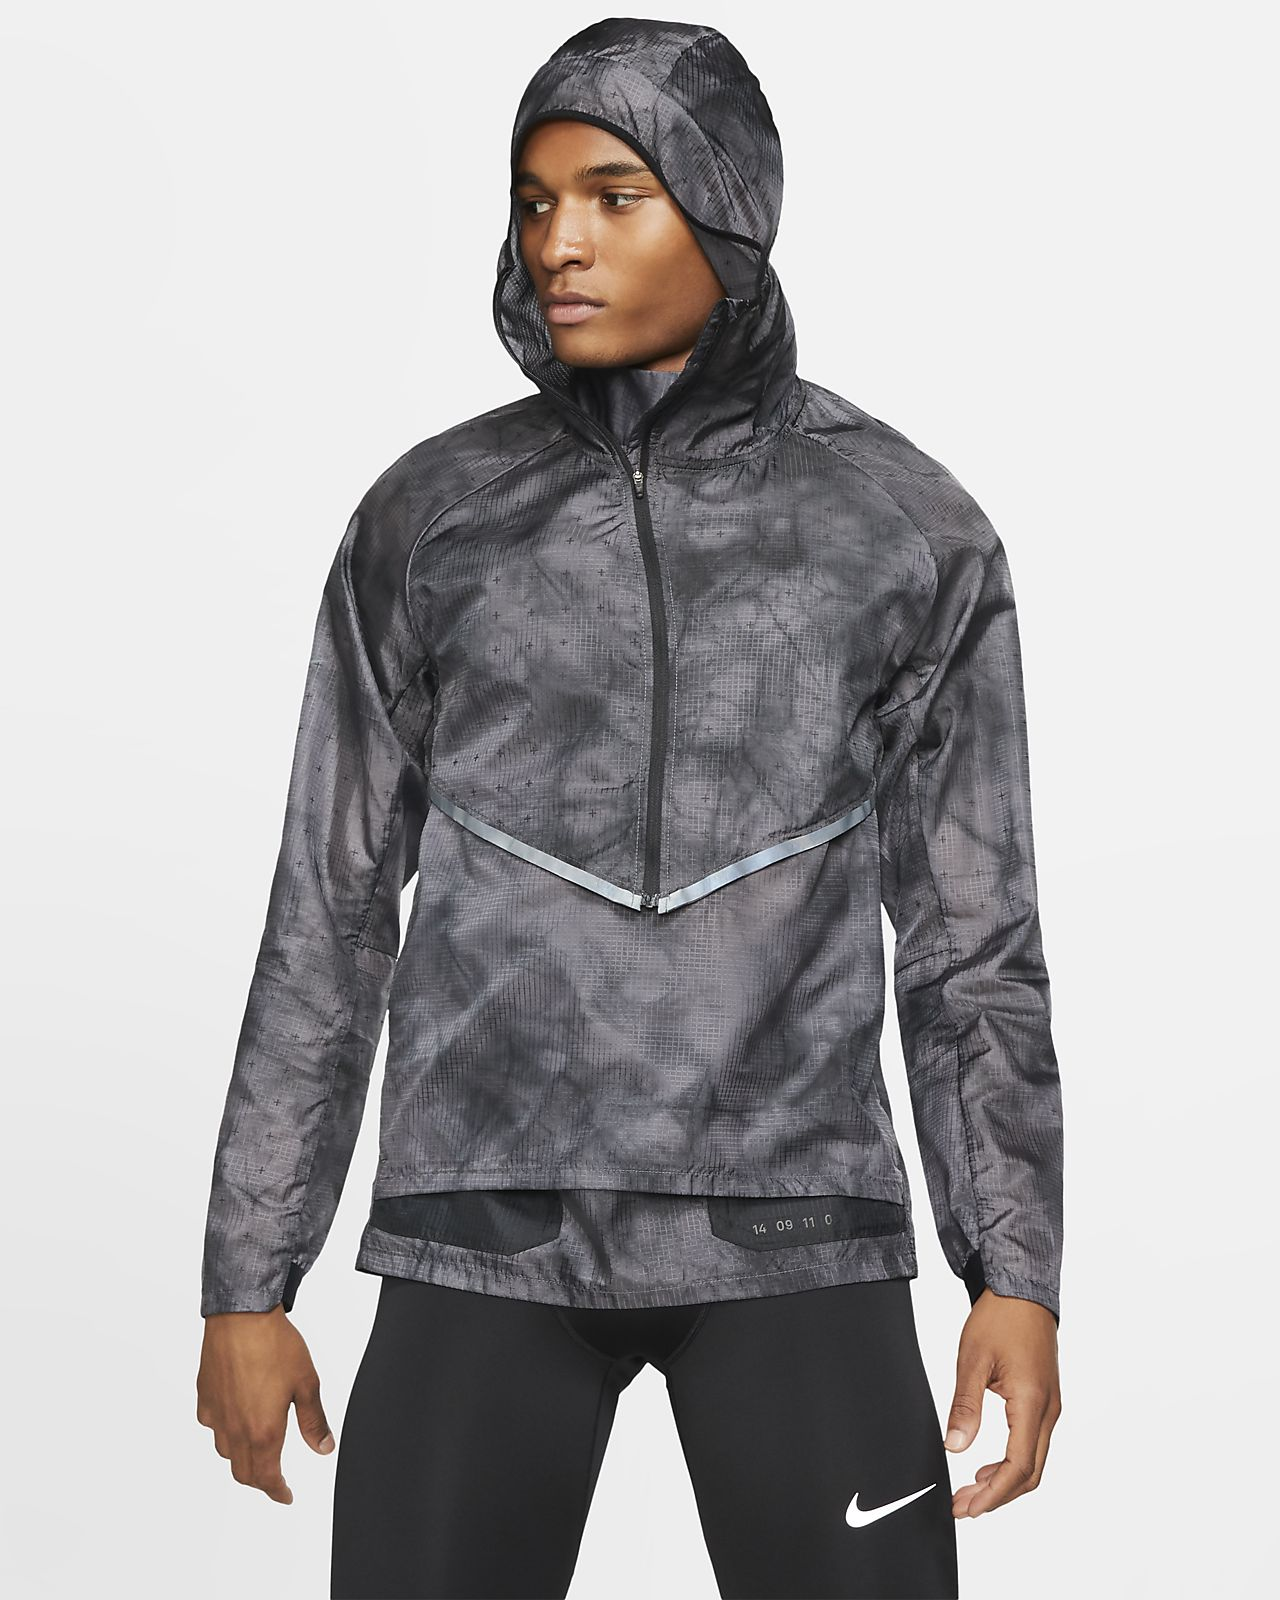 Chamarra de running con capucha para hombre Nike Tech Pack